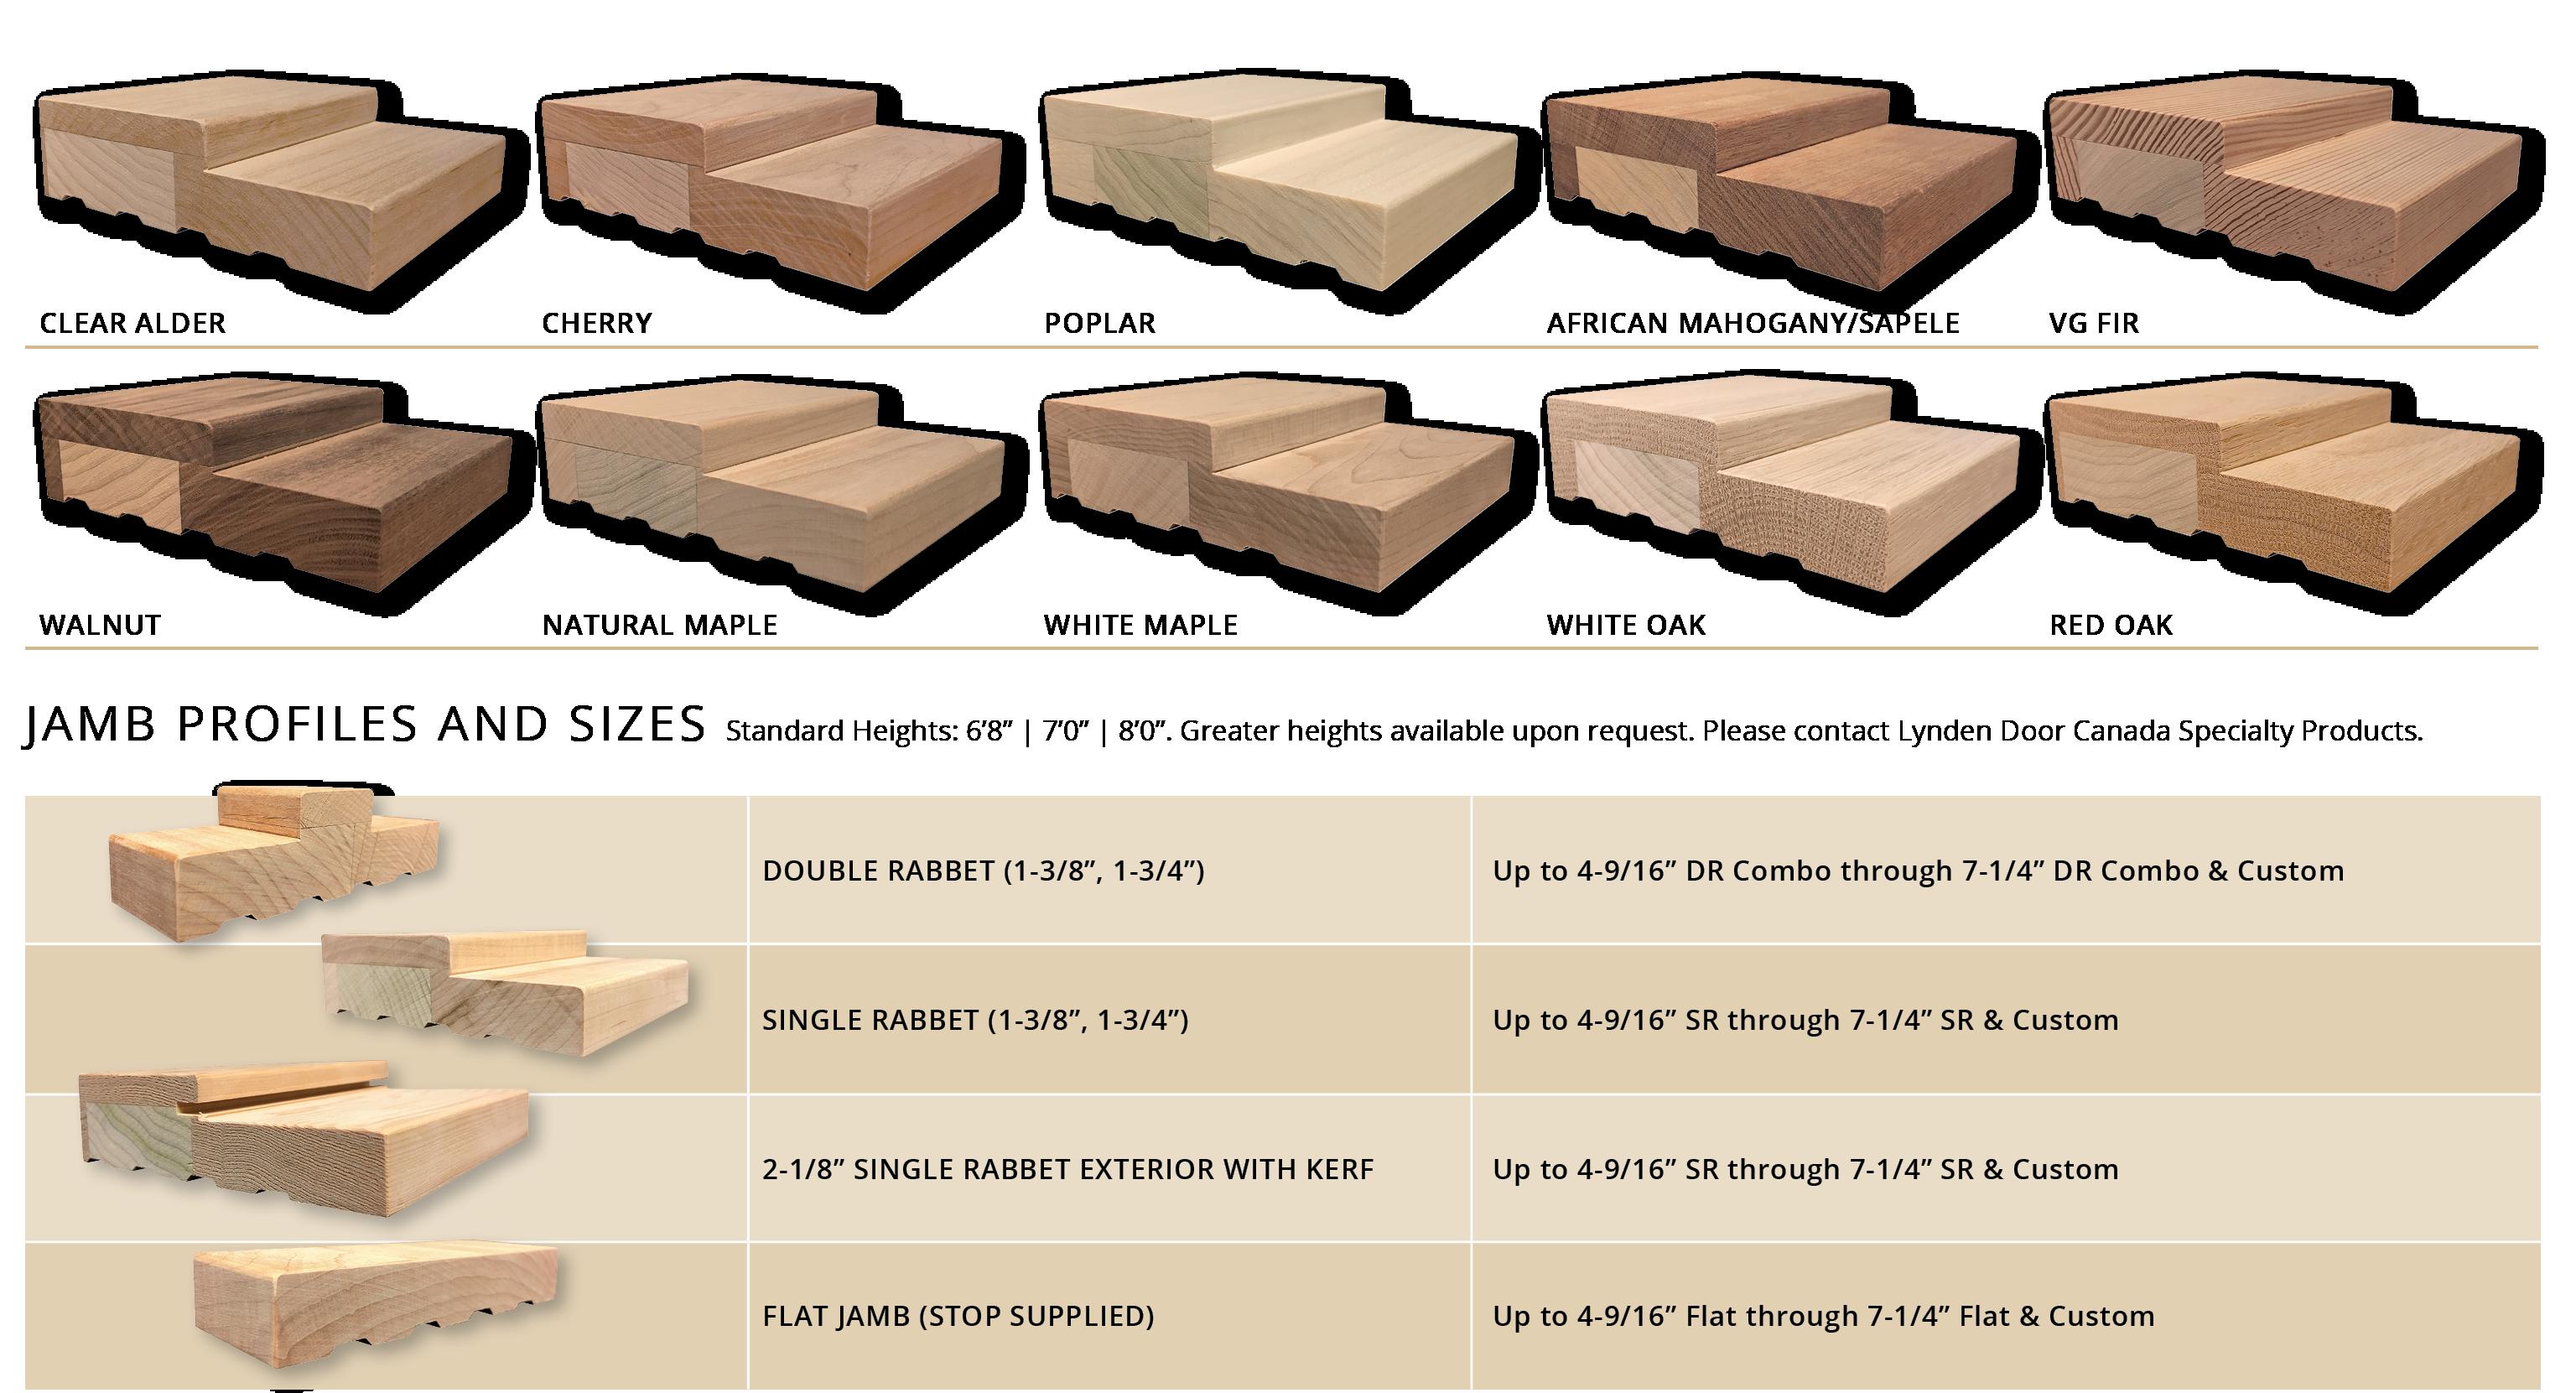 LDC SP Hardwood Jambs